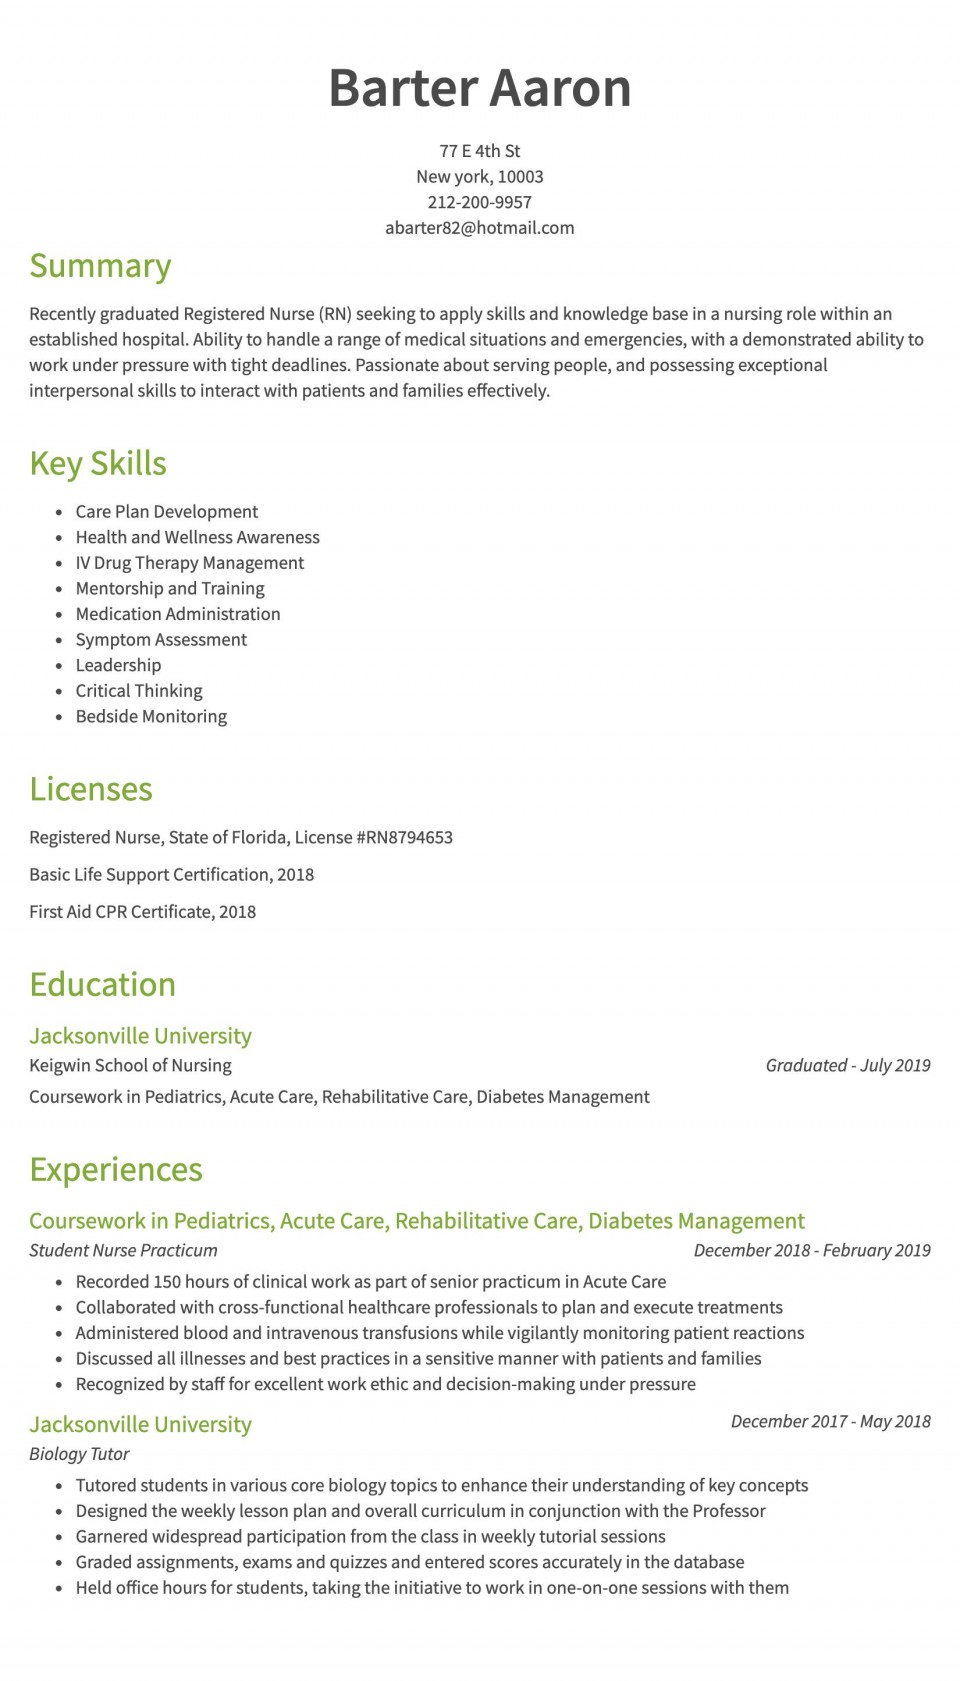 007 Striking Rn Graduate Resume Template High Resolution  New Grad Nurse960